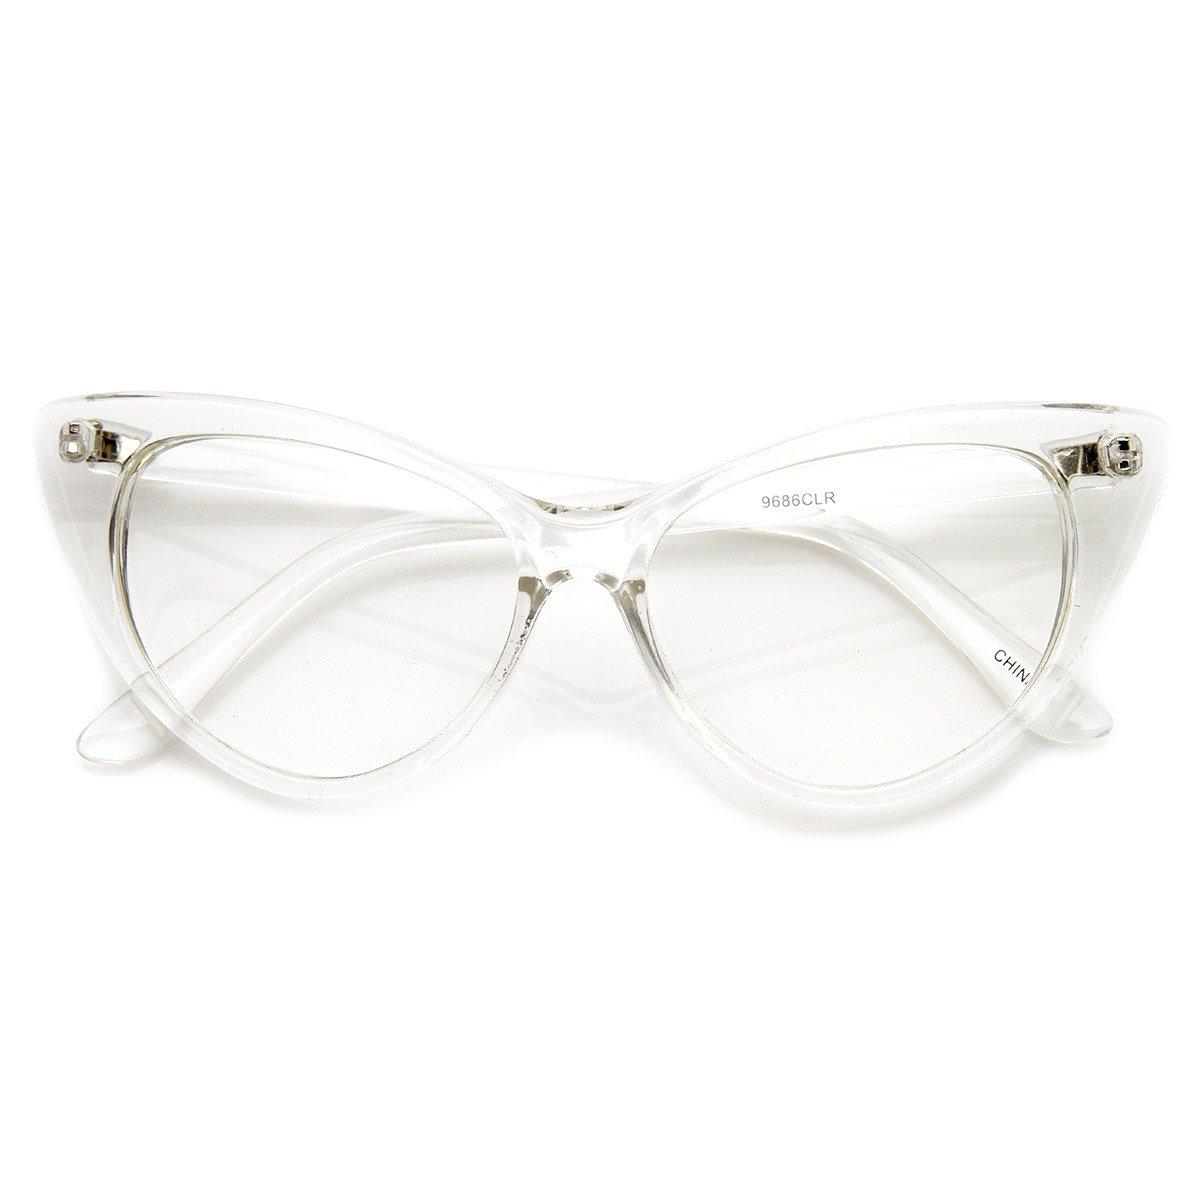 zeroUV- Super Cat Eye Glasses Vintage Inspired Mod Fashion Clear Lens Eyewear